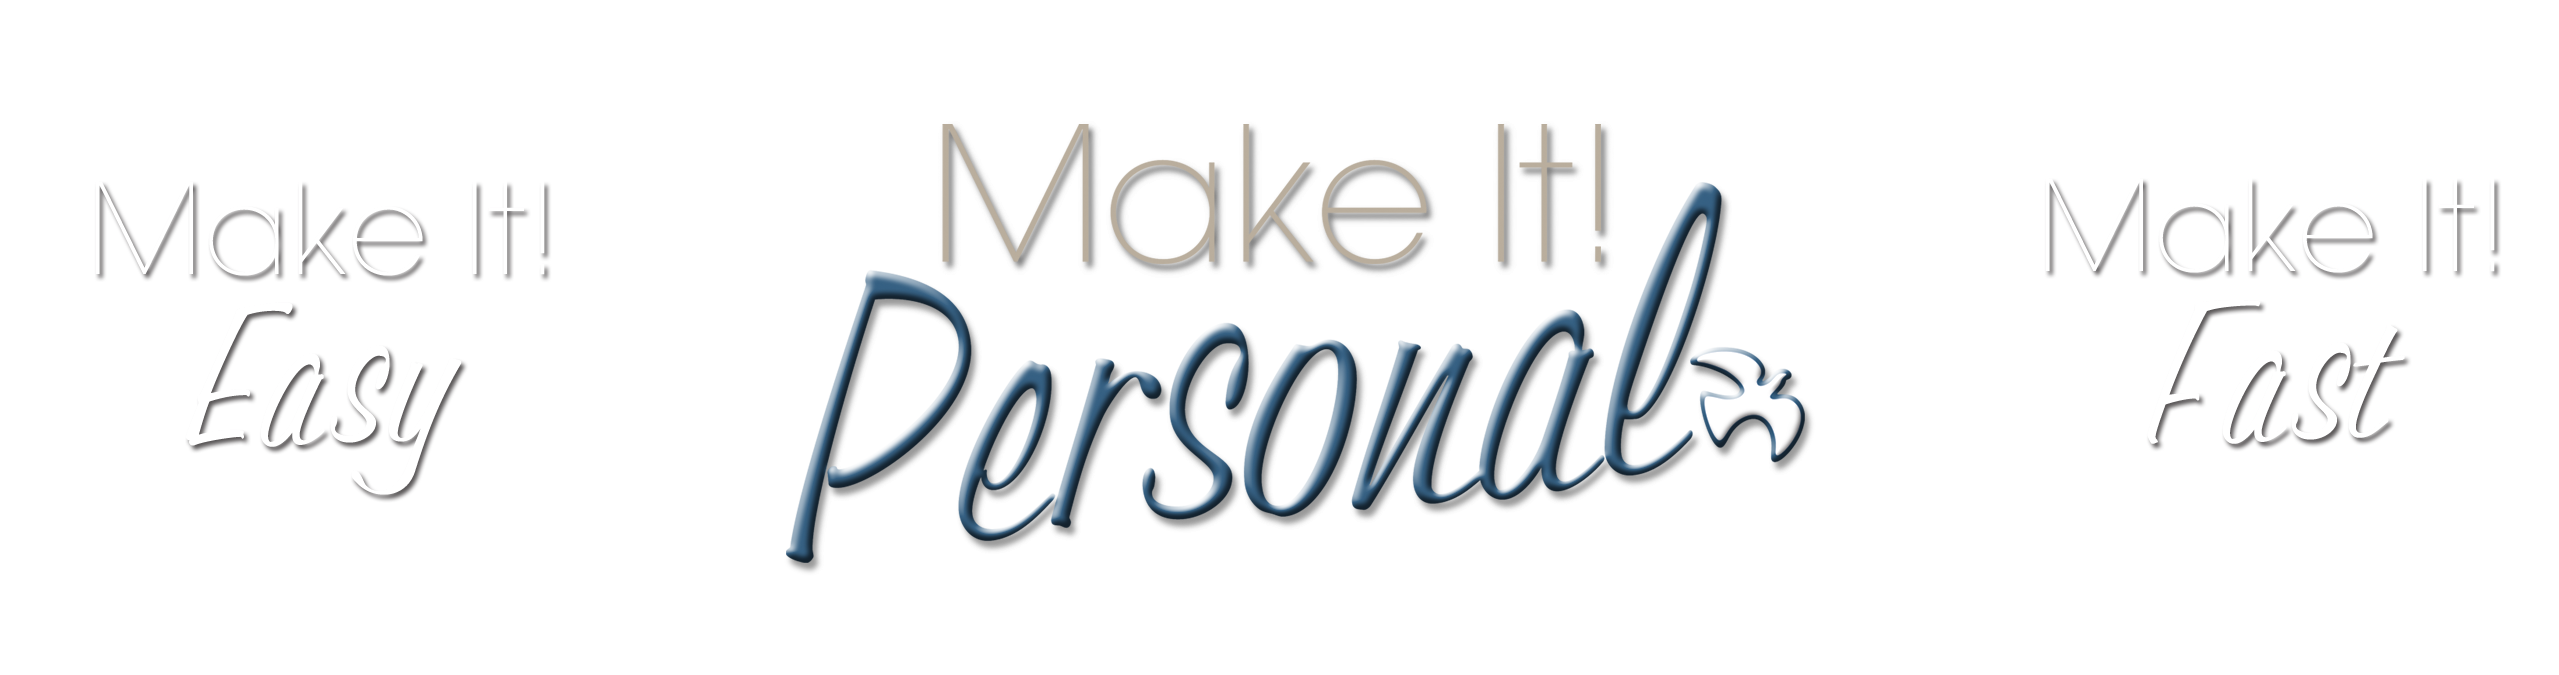 Make it! Personal